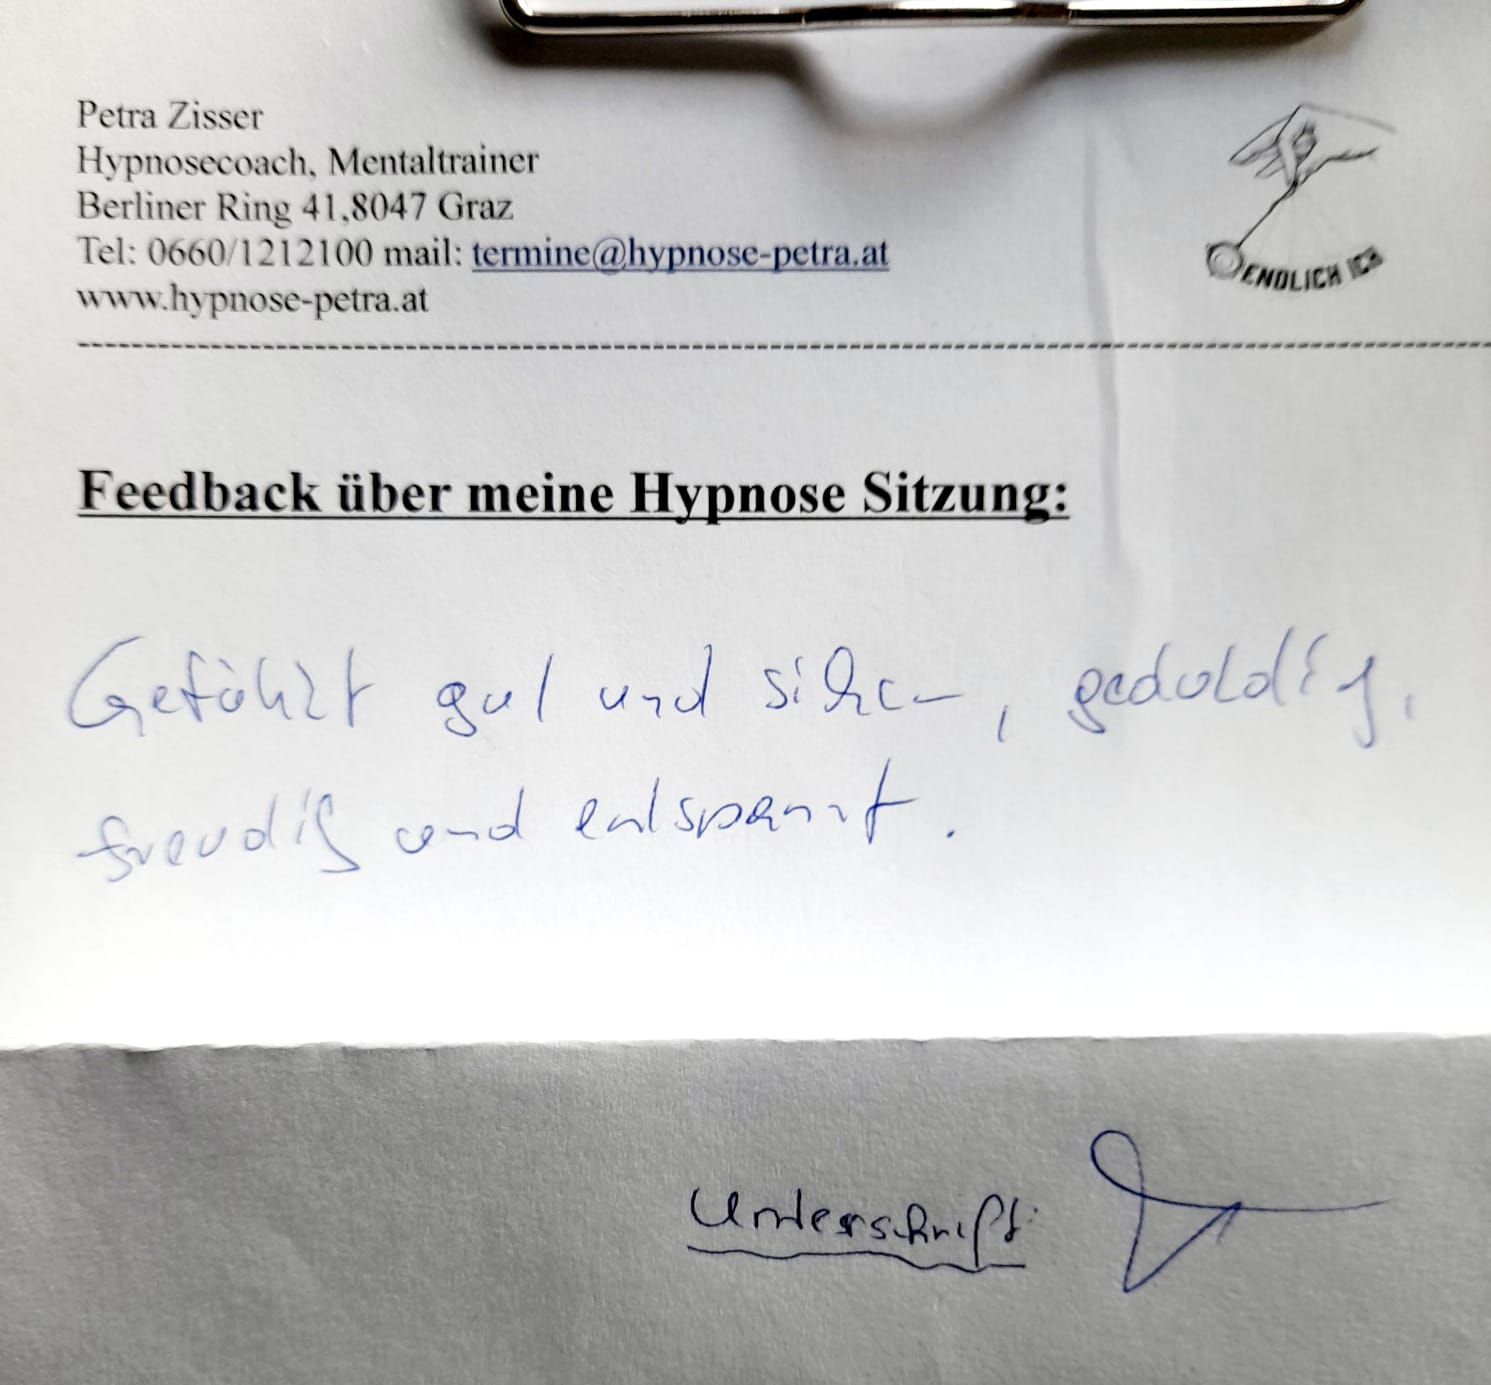 Feedback Meinung Hypnose Graz Petra Zisser